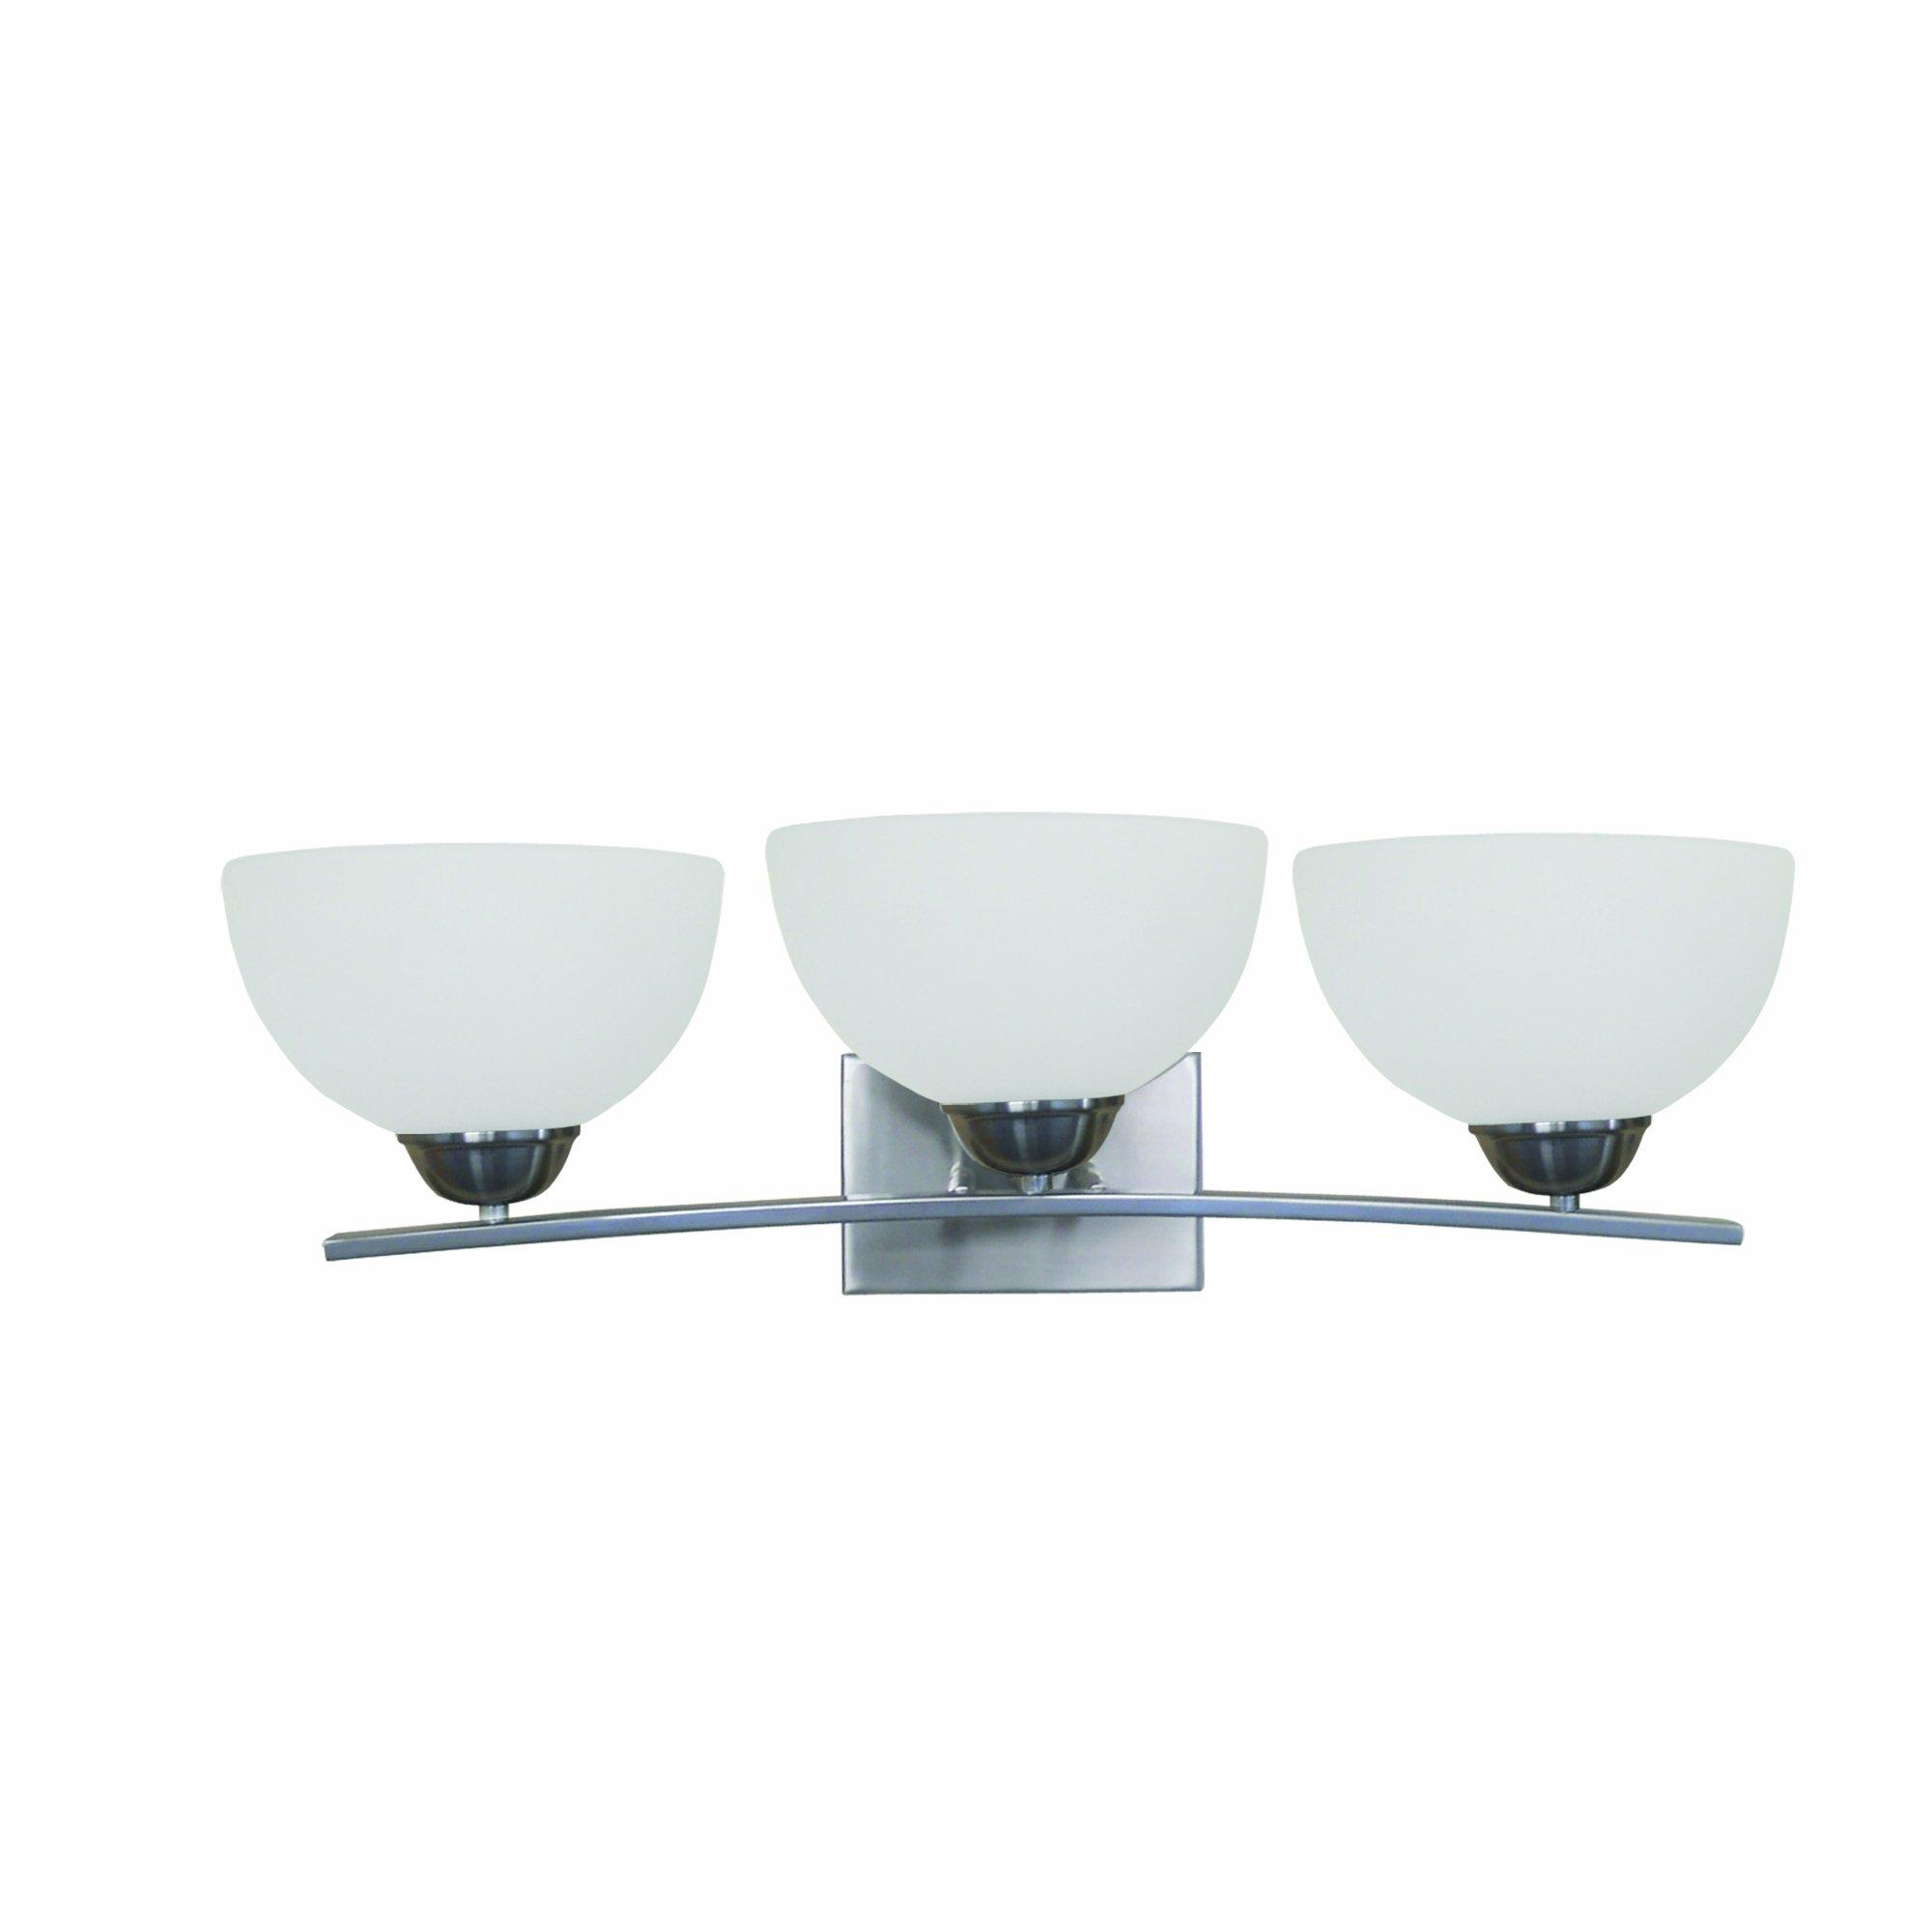 Yosemite Home Decor 107-3V-AWSS 3-Lights Bathroom Vanity with White Glass, Satin Steel